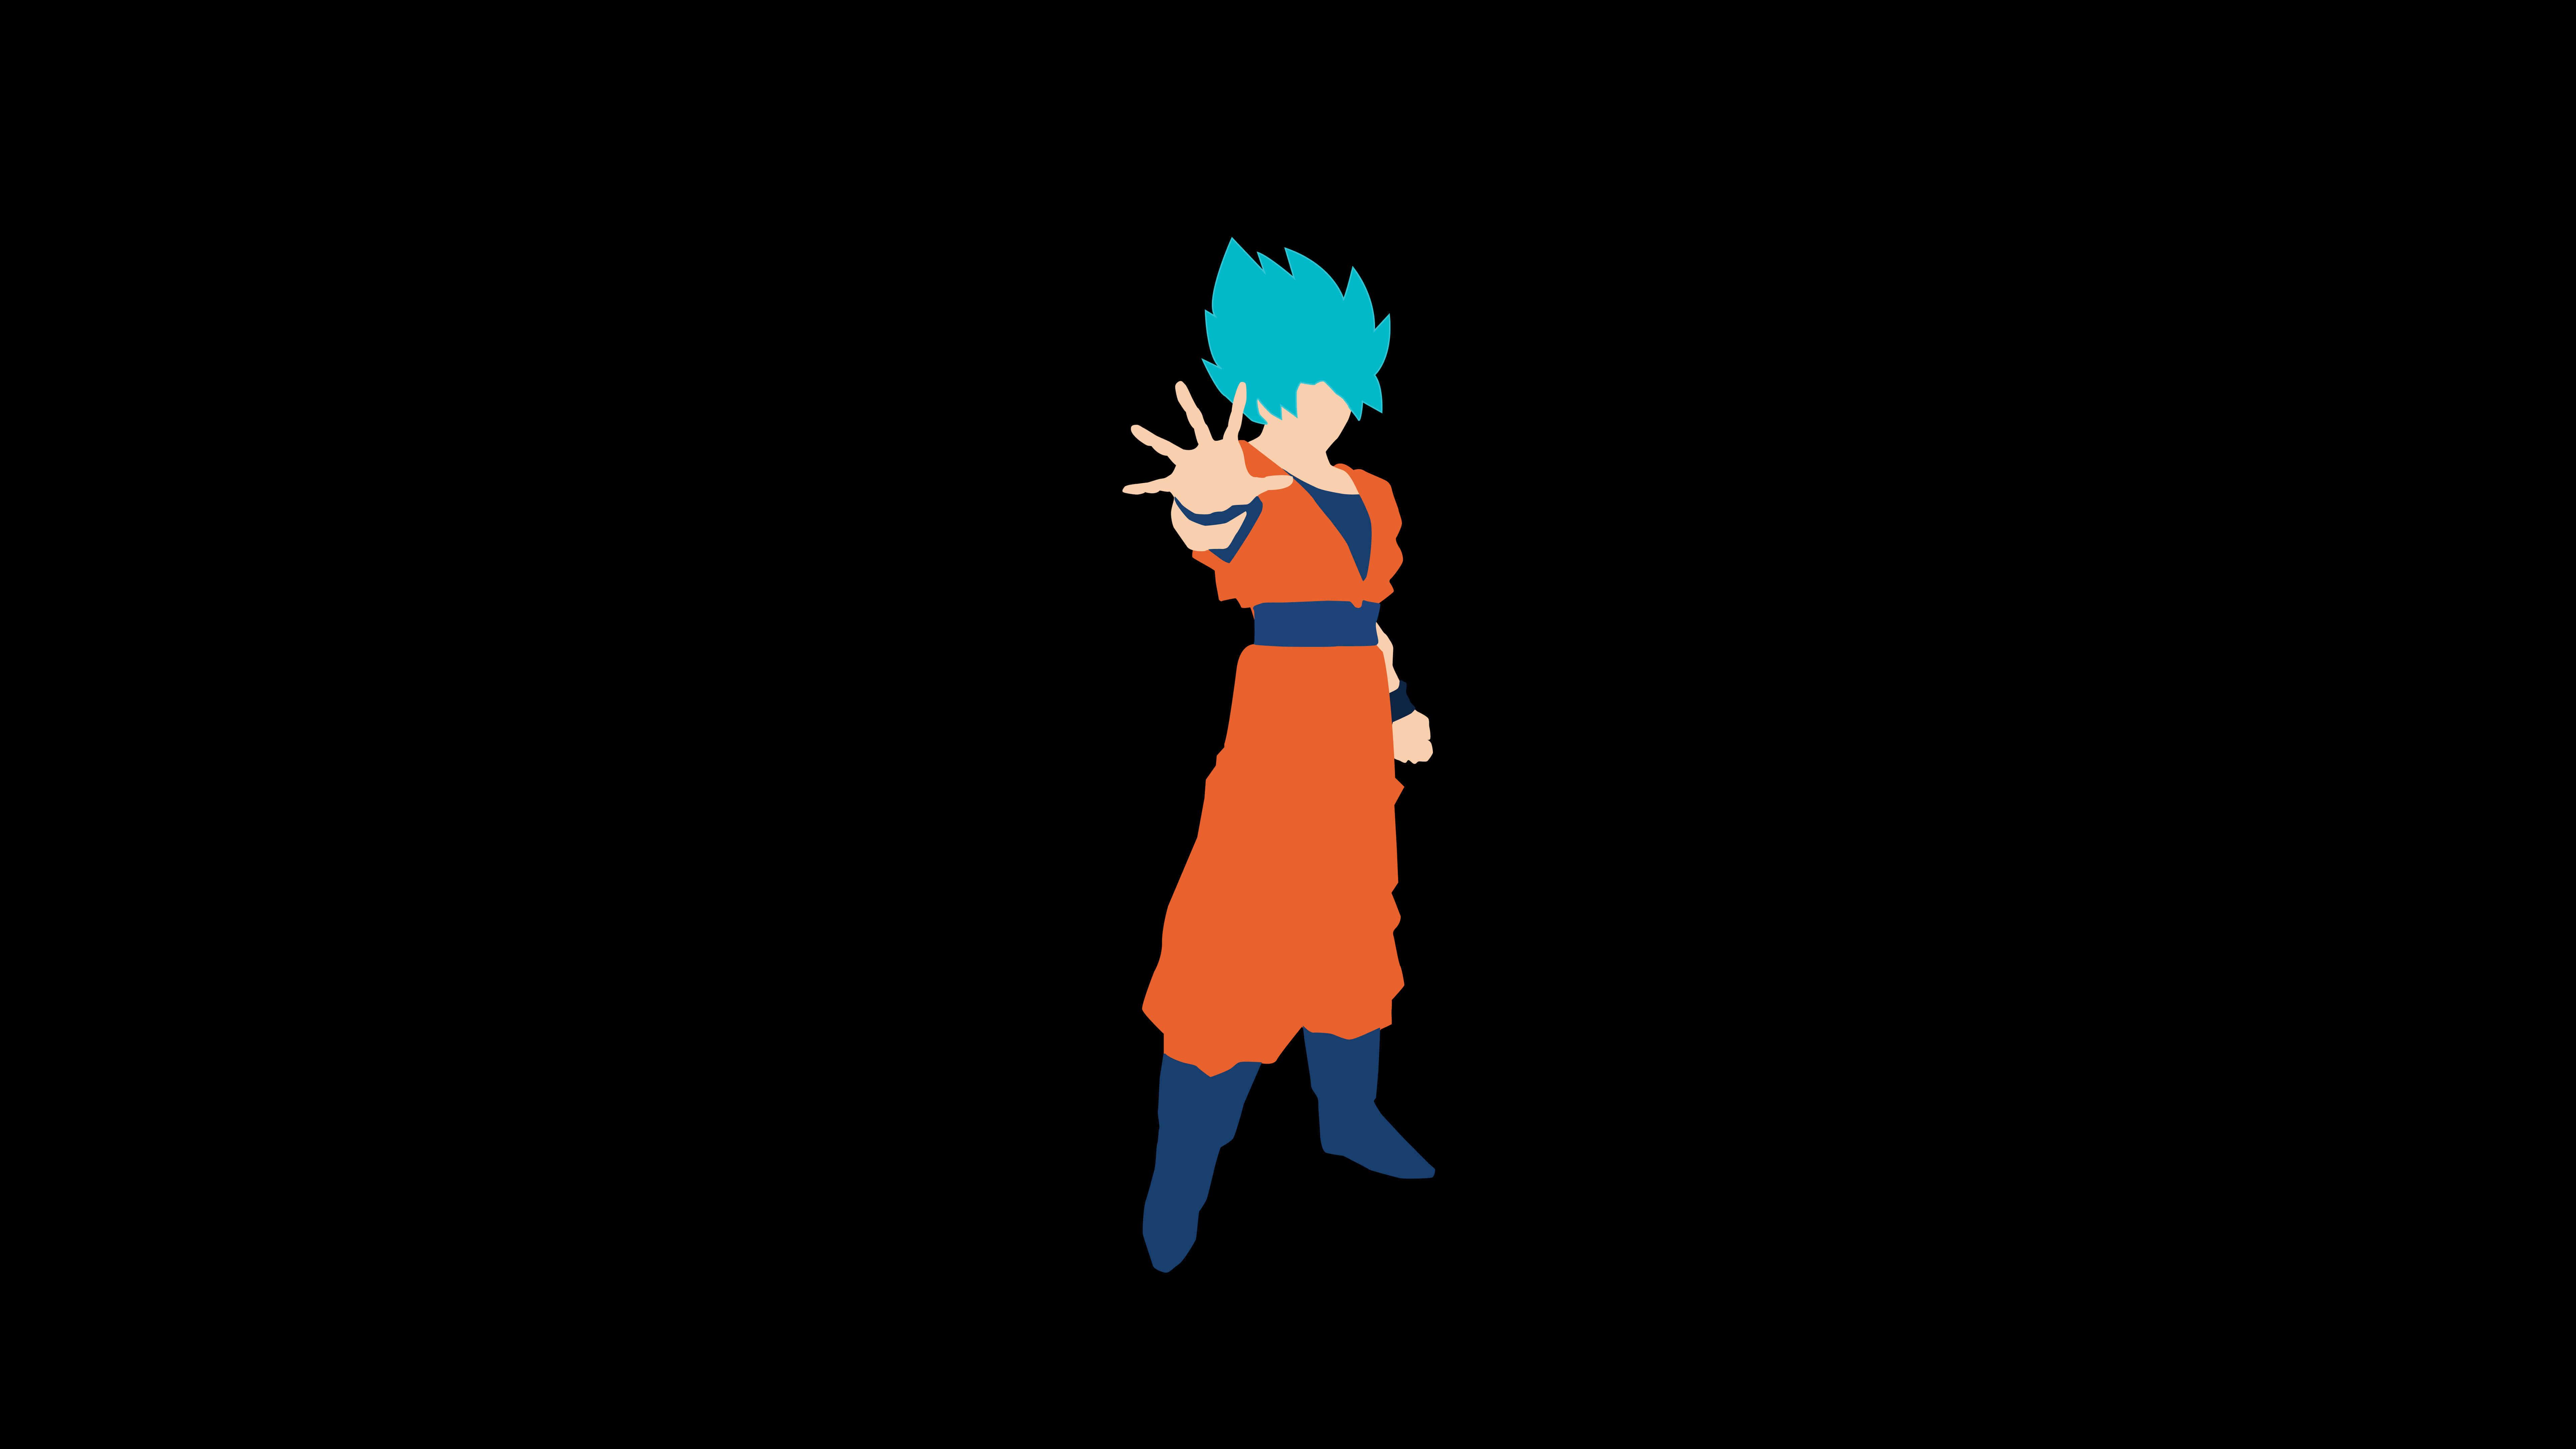 Goku Minimalist Black Wallpapers Wallpaper Cave